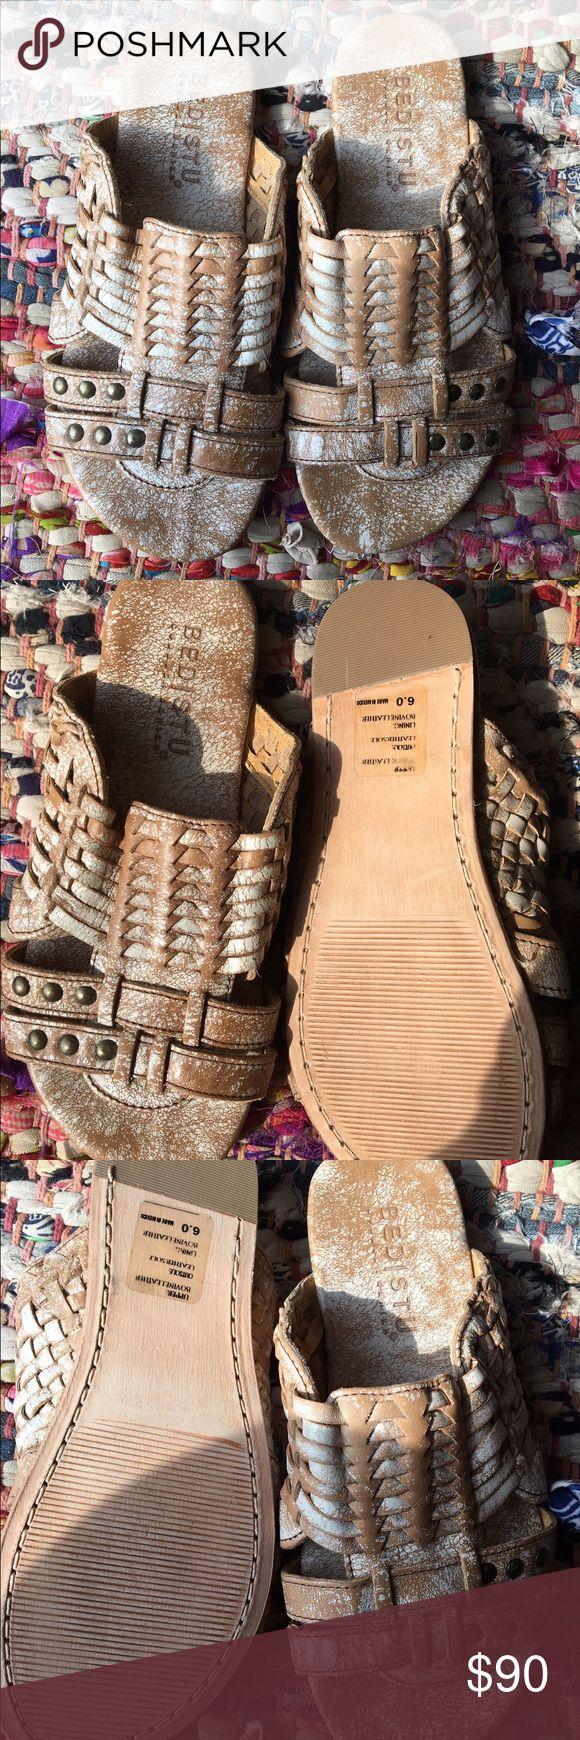 Bed Stu sandals size 6 never worn Bed Stu sandals size 6 never worn $100 Bed Stu Shoes Sandals